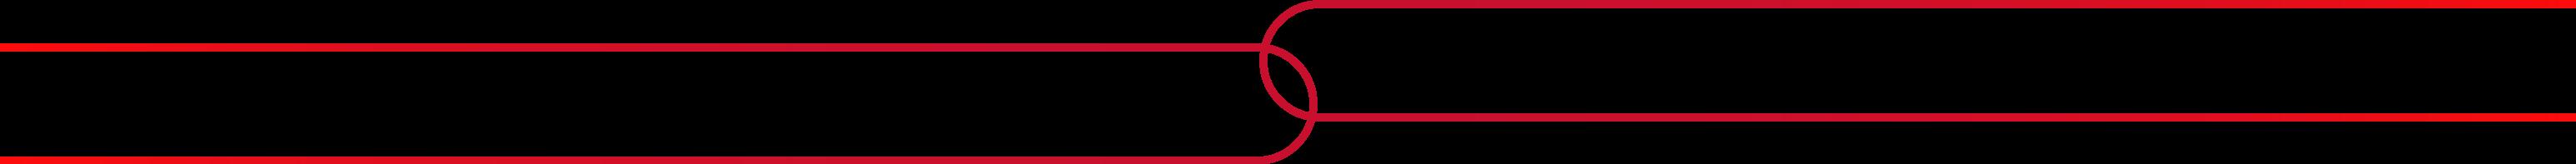 separator-link-center